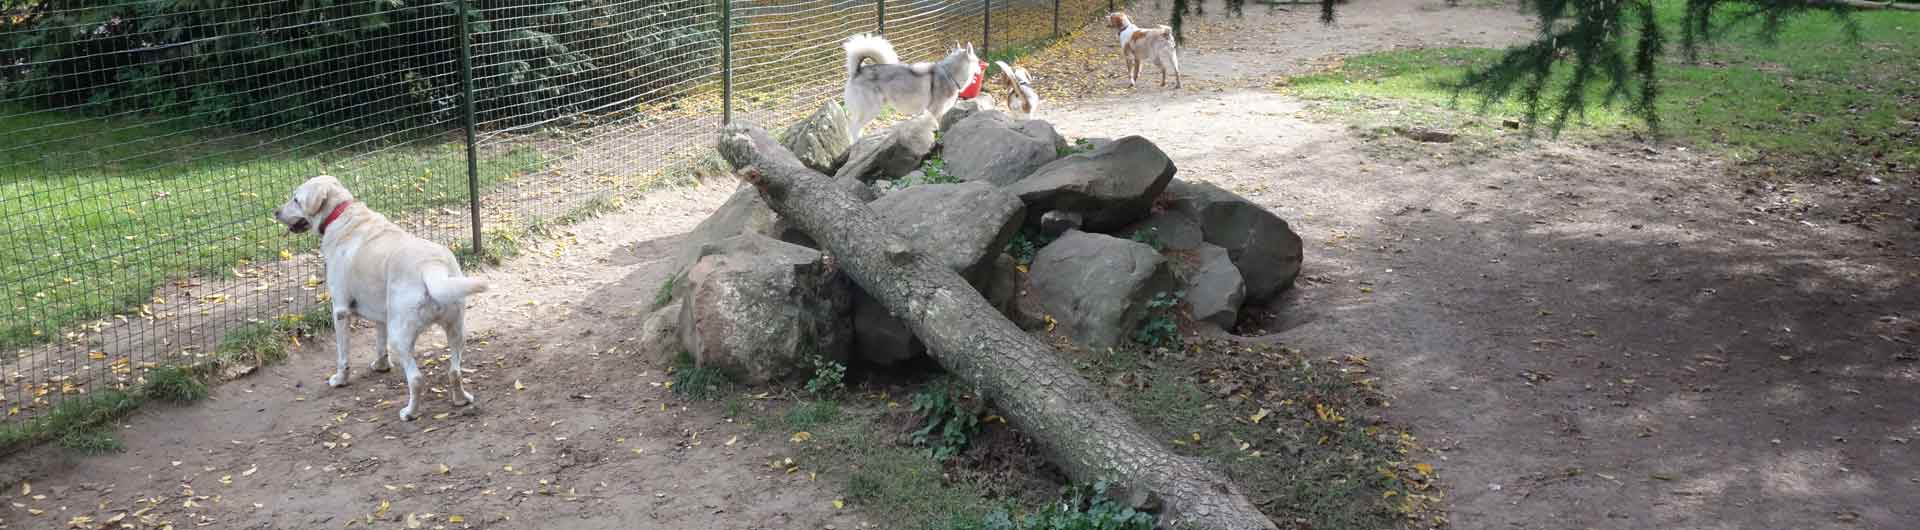 pension-chien-yvelines